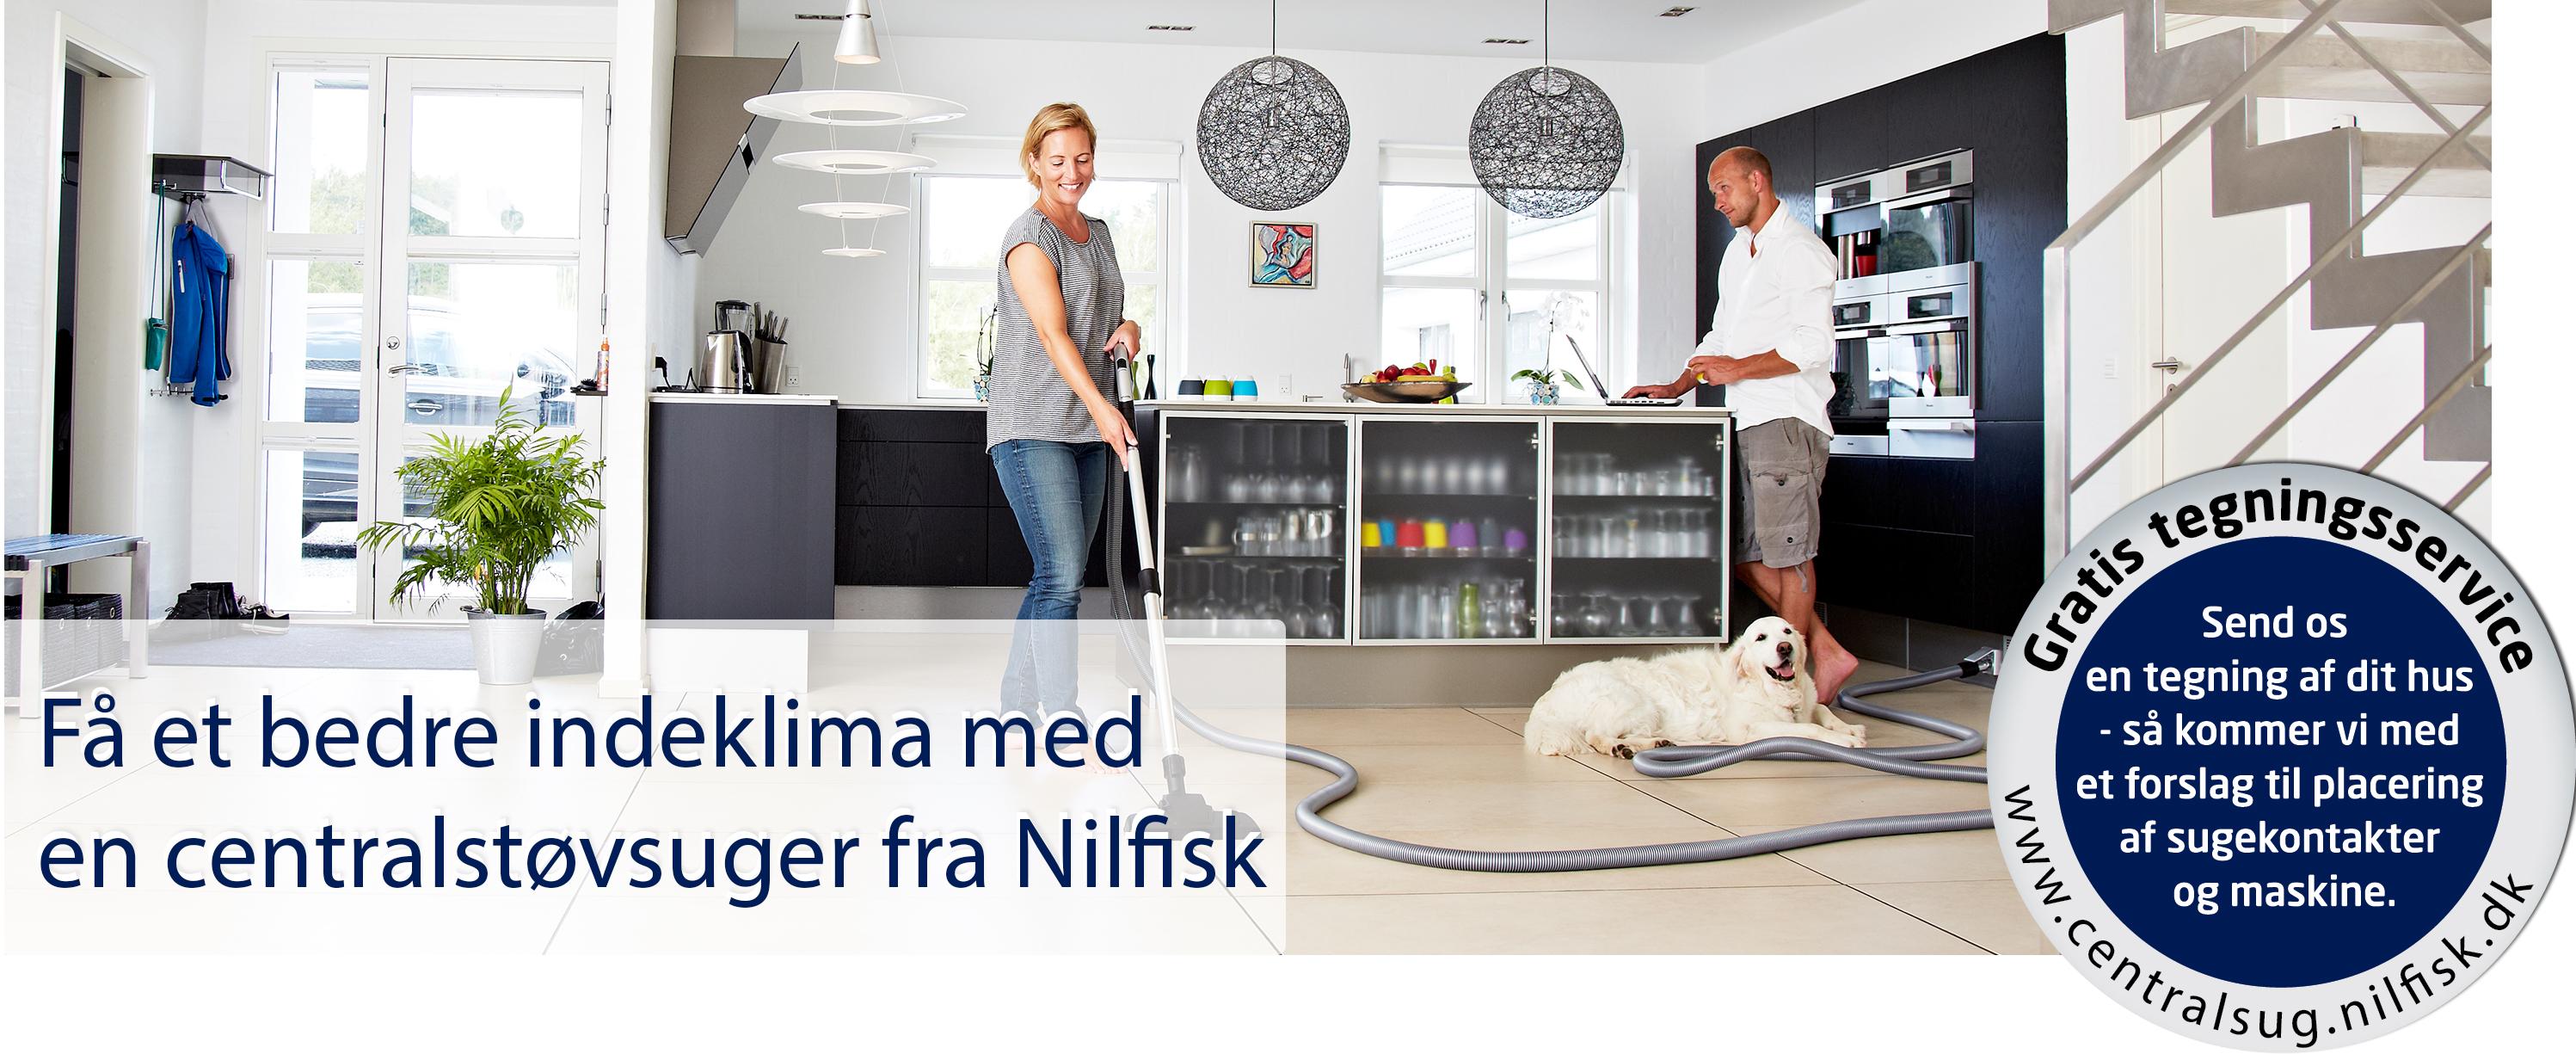 Nilfisk-frithiof